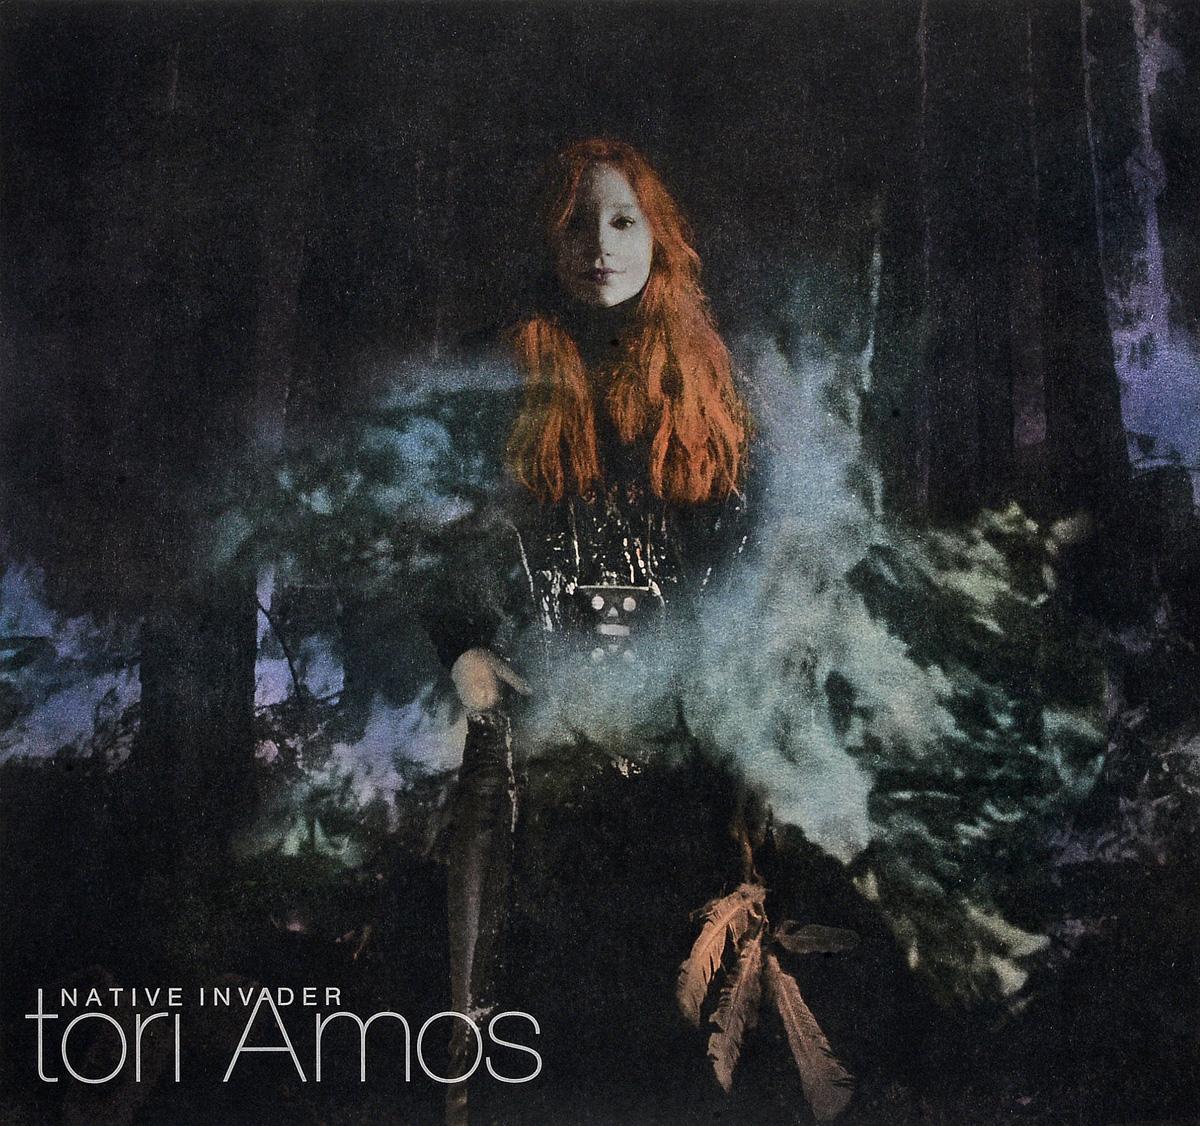 цена на Тори Эмос Tori Amos. Native Invader (2 LP)